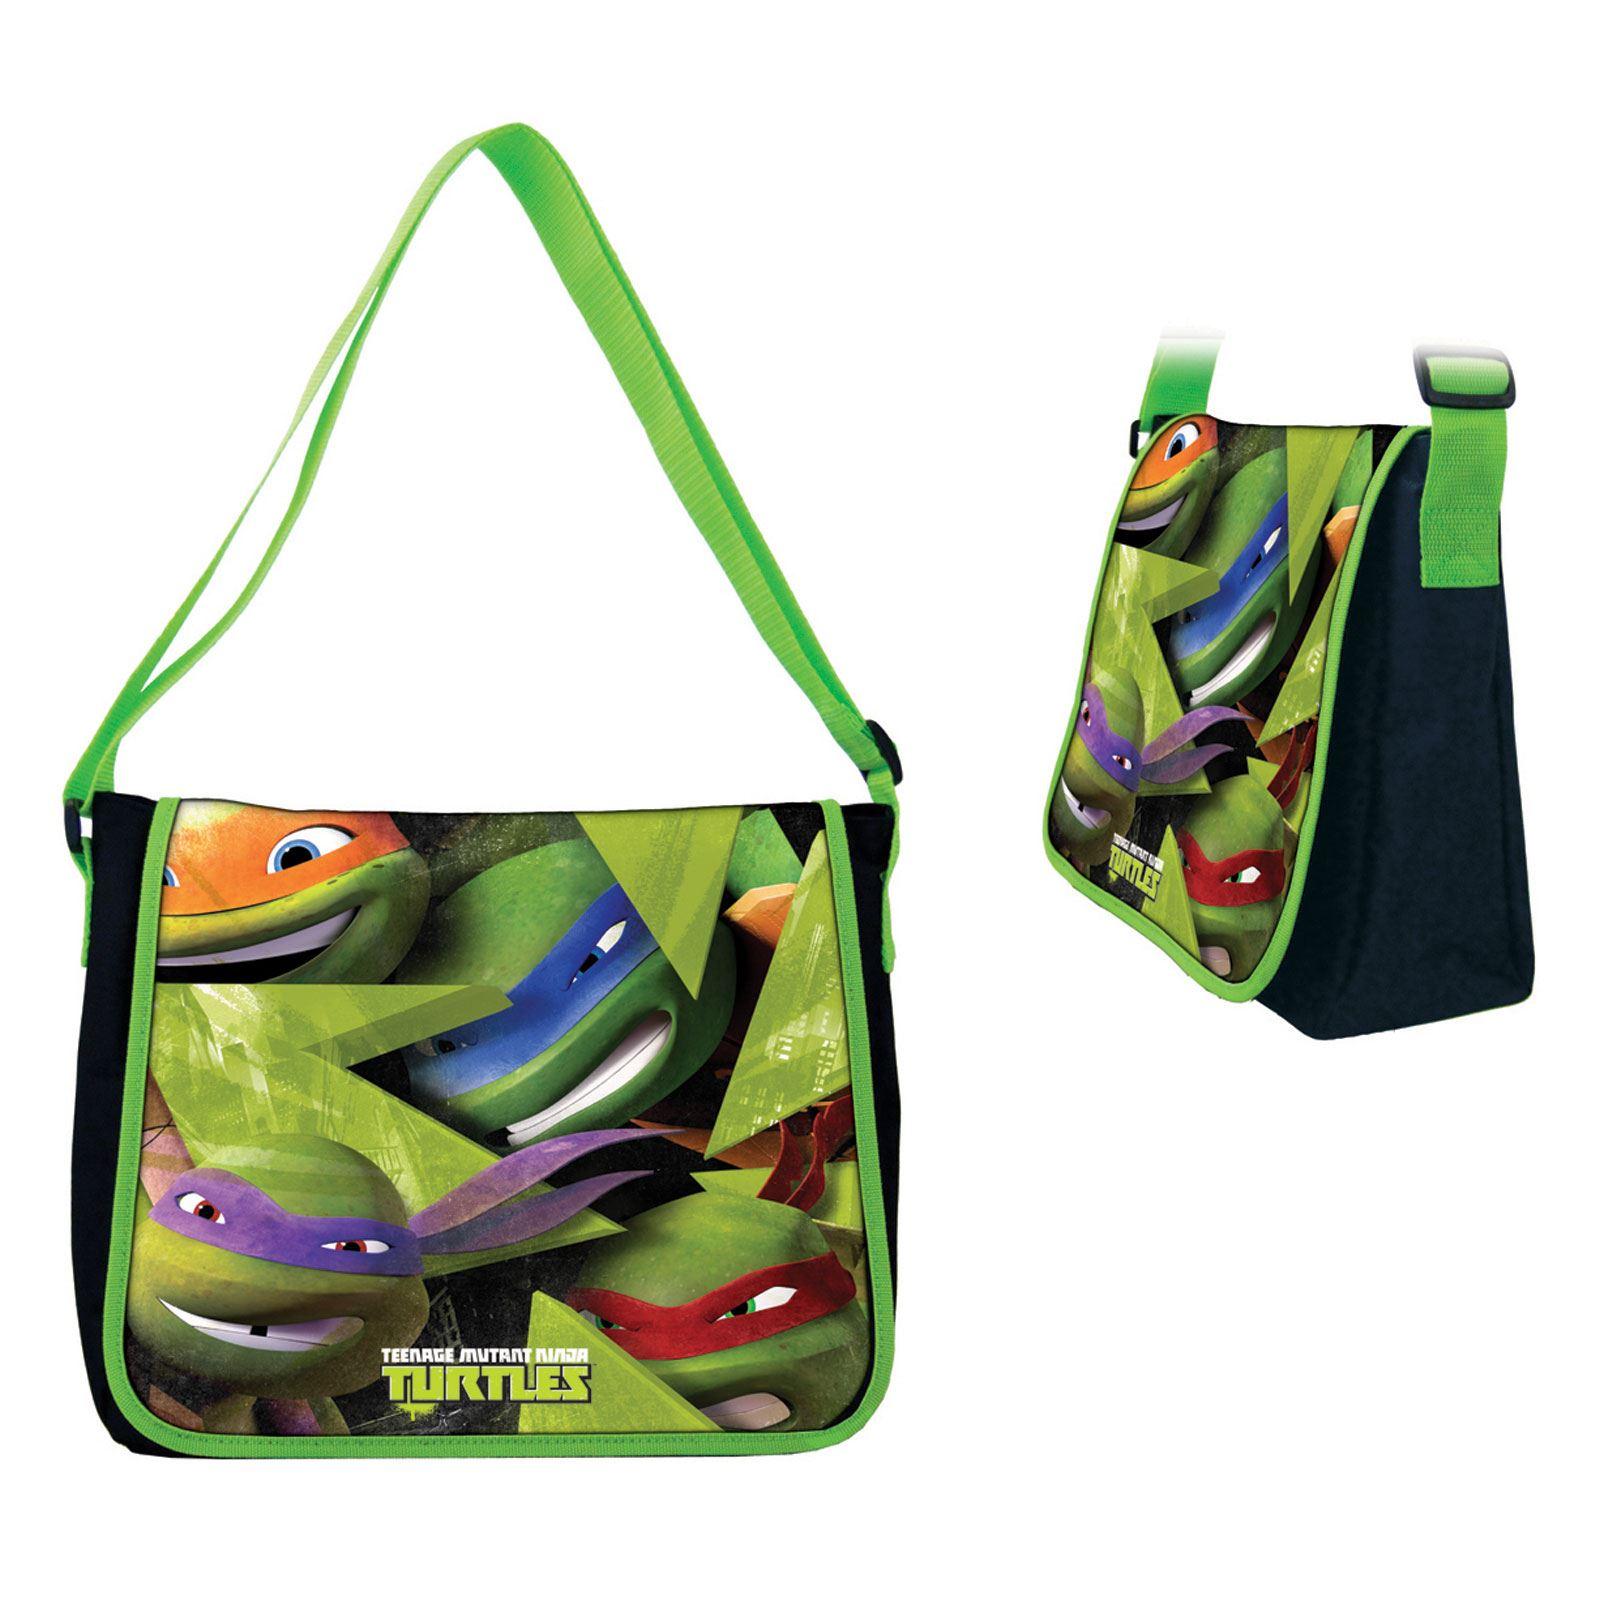 Teenage Mutant Ninja Turtles Bedding Single And Double Duvet Covers EBay